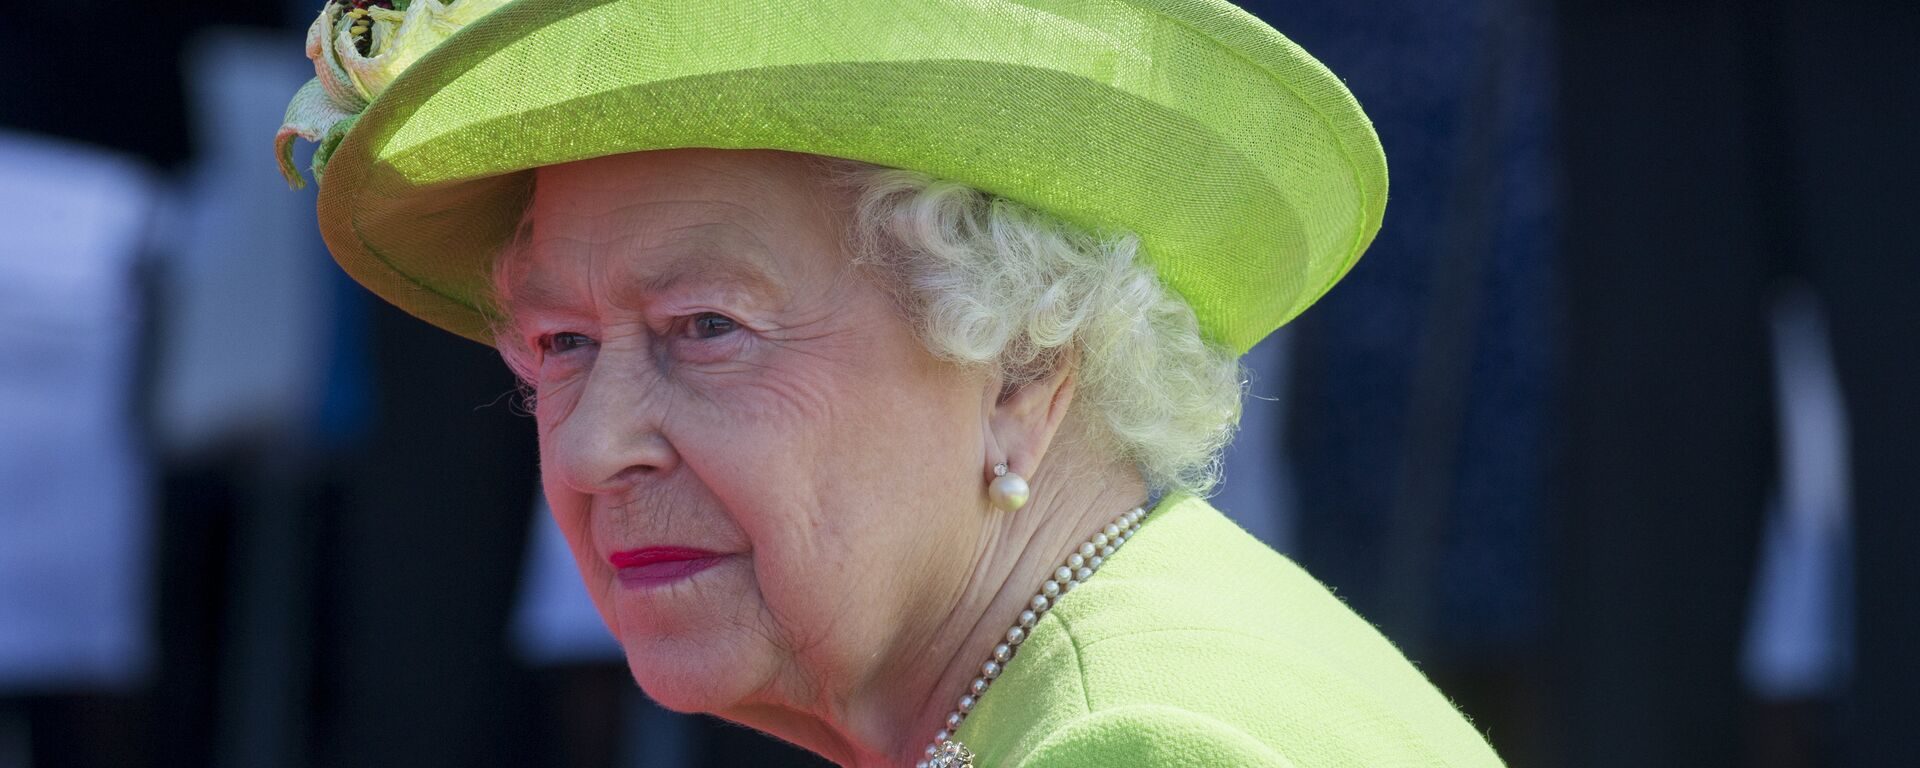 Королева Великобритании Елизавета II, архивное фото - Sputnik Узбекистан, 1920, 02.08.2021